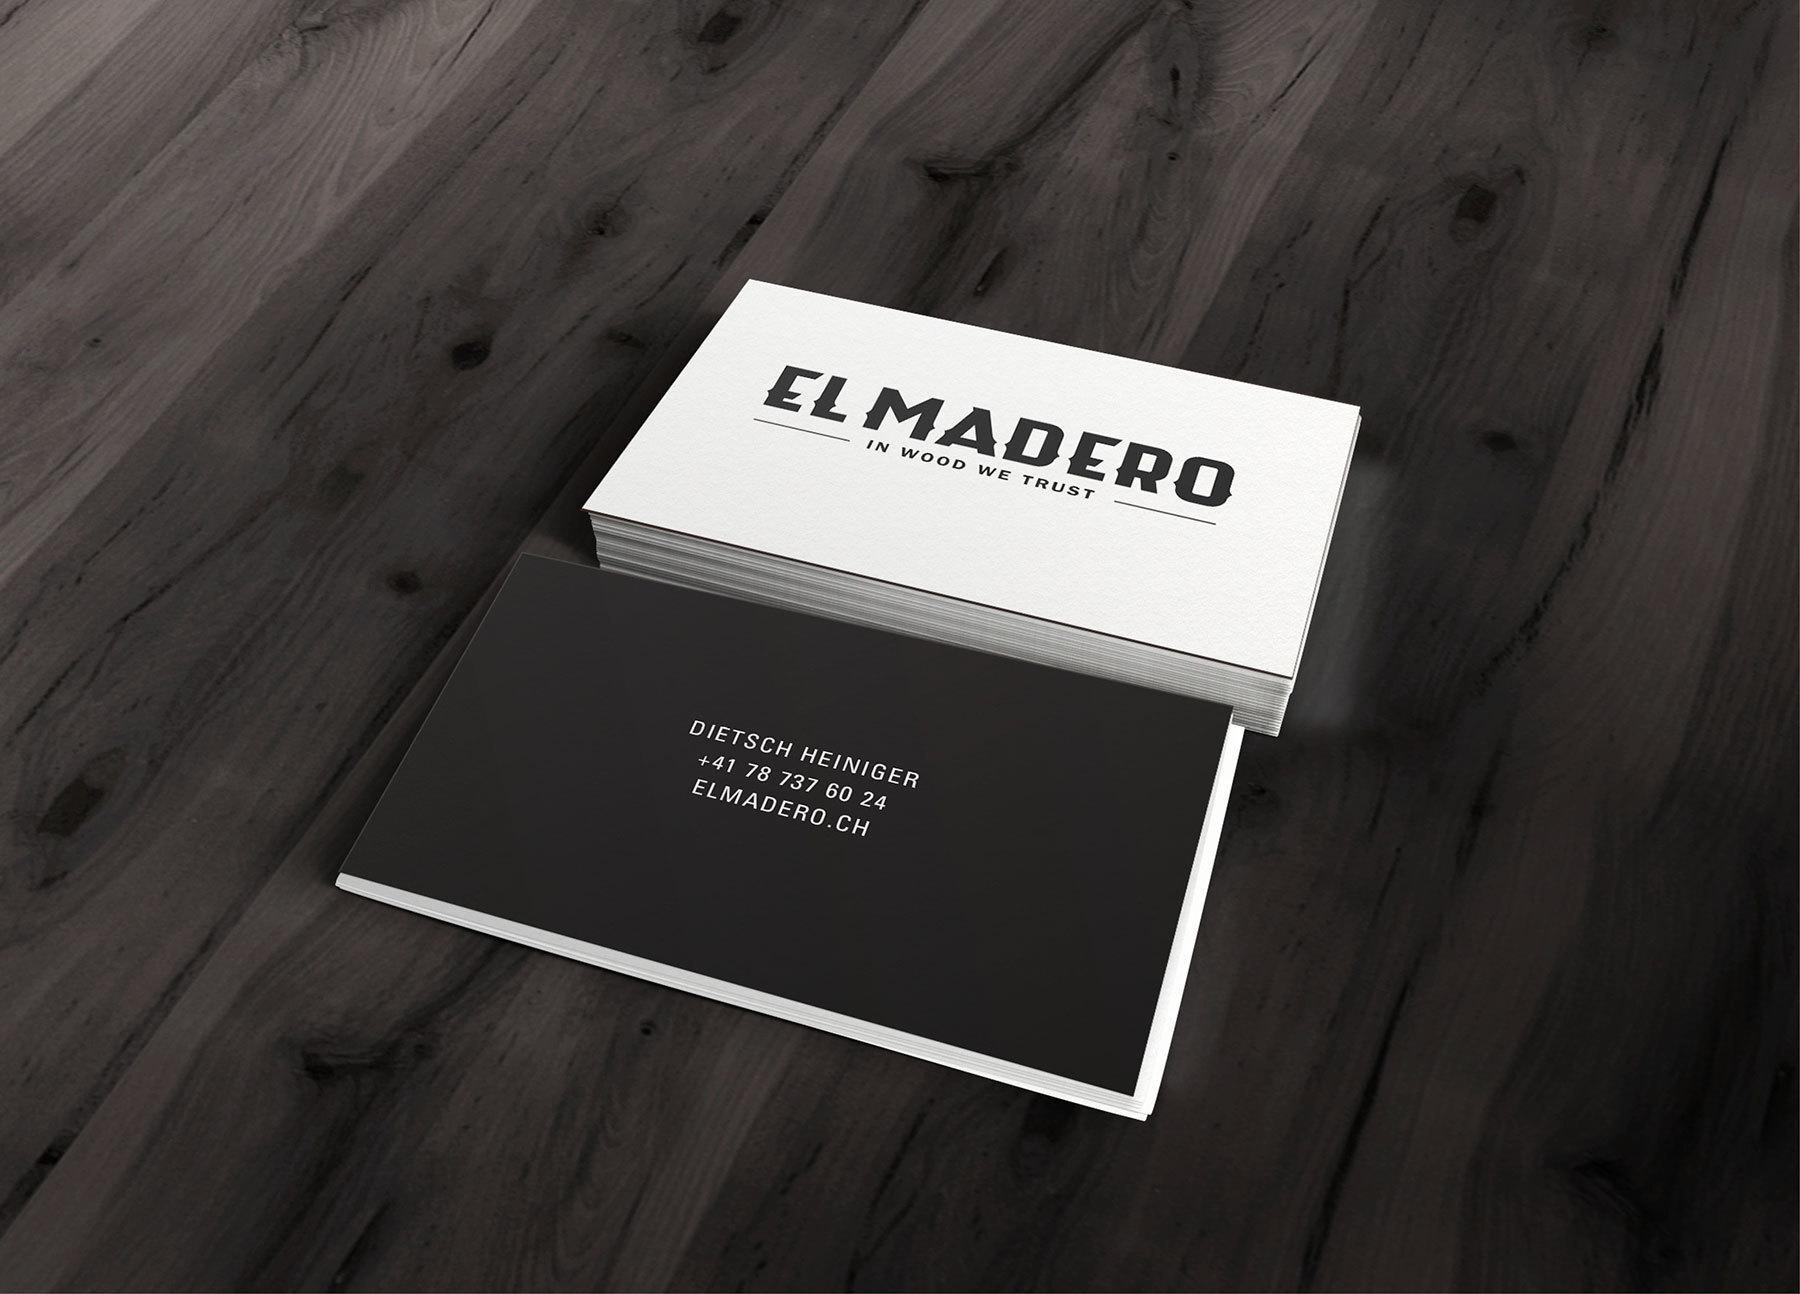 El Madero Branding 07 MHG Bern